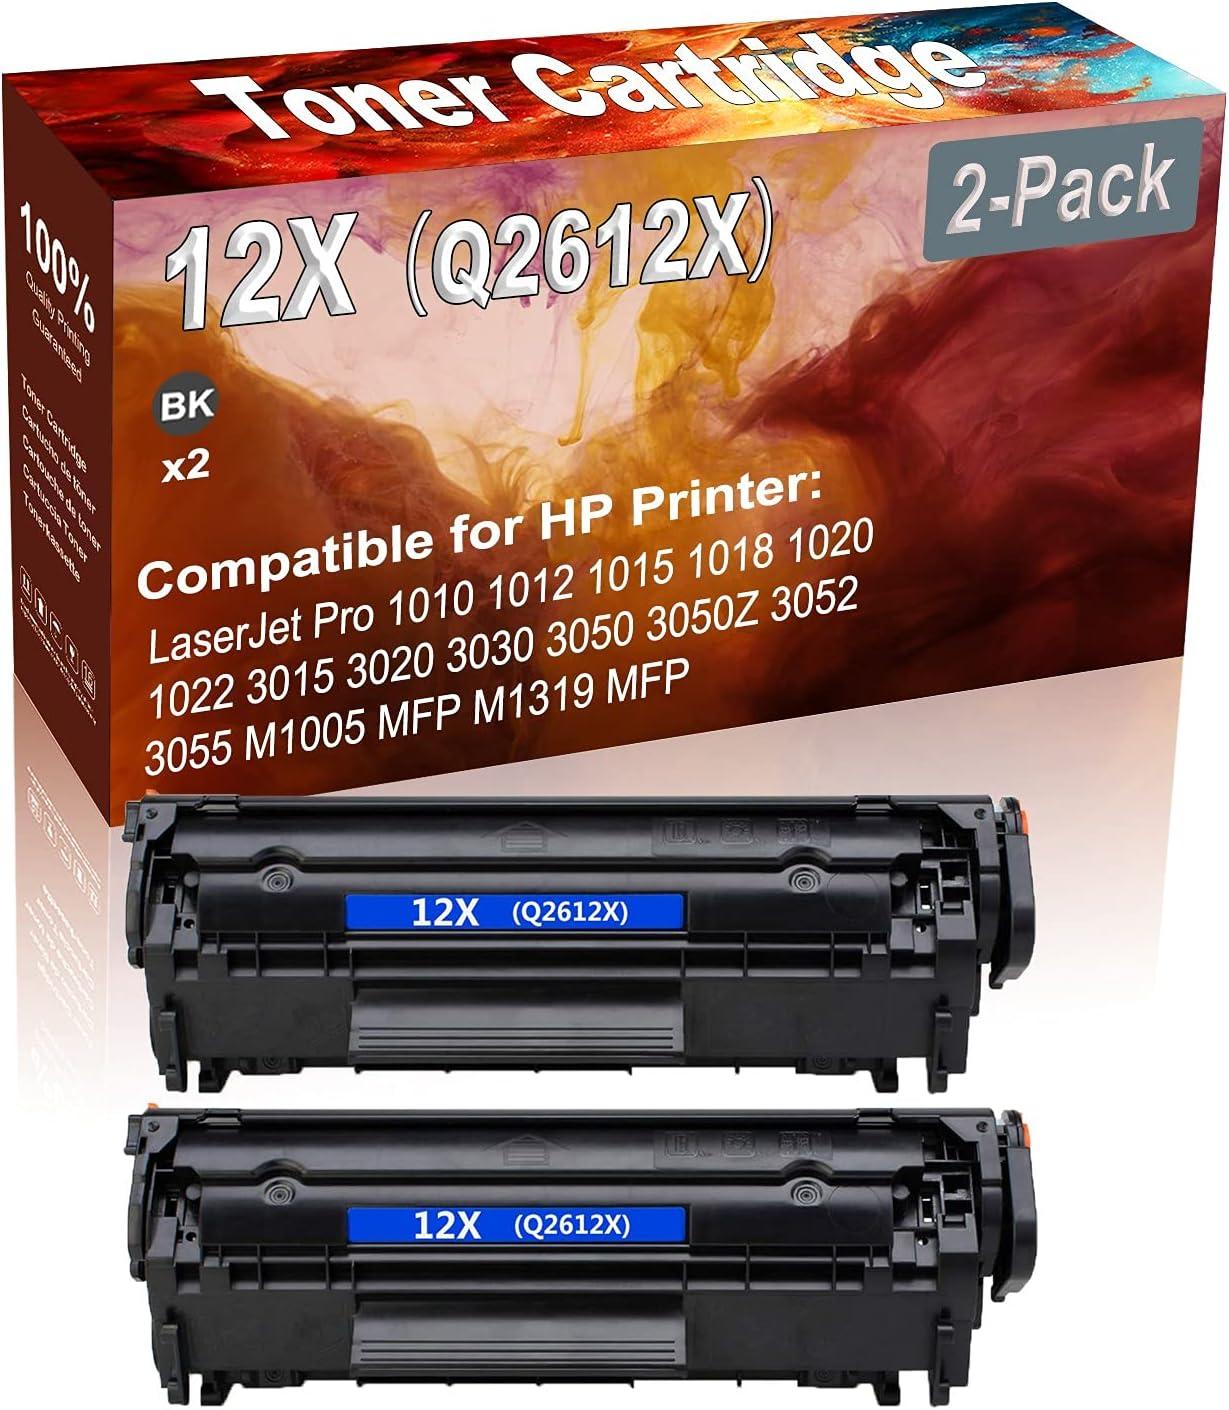 2-Pack (Black) Compatible 12X (Q2612X) Printer Toner Cartridge (High Capacity) fit for 1010 1012 1015 1018 1020 1022 3015 3020 3030 3050 3050Z 3052 3055 M1005 MFP M1319 MFP Printer